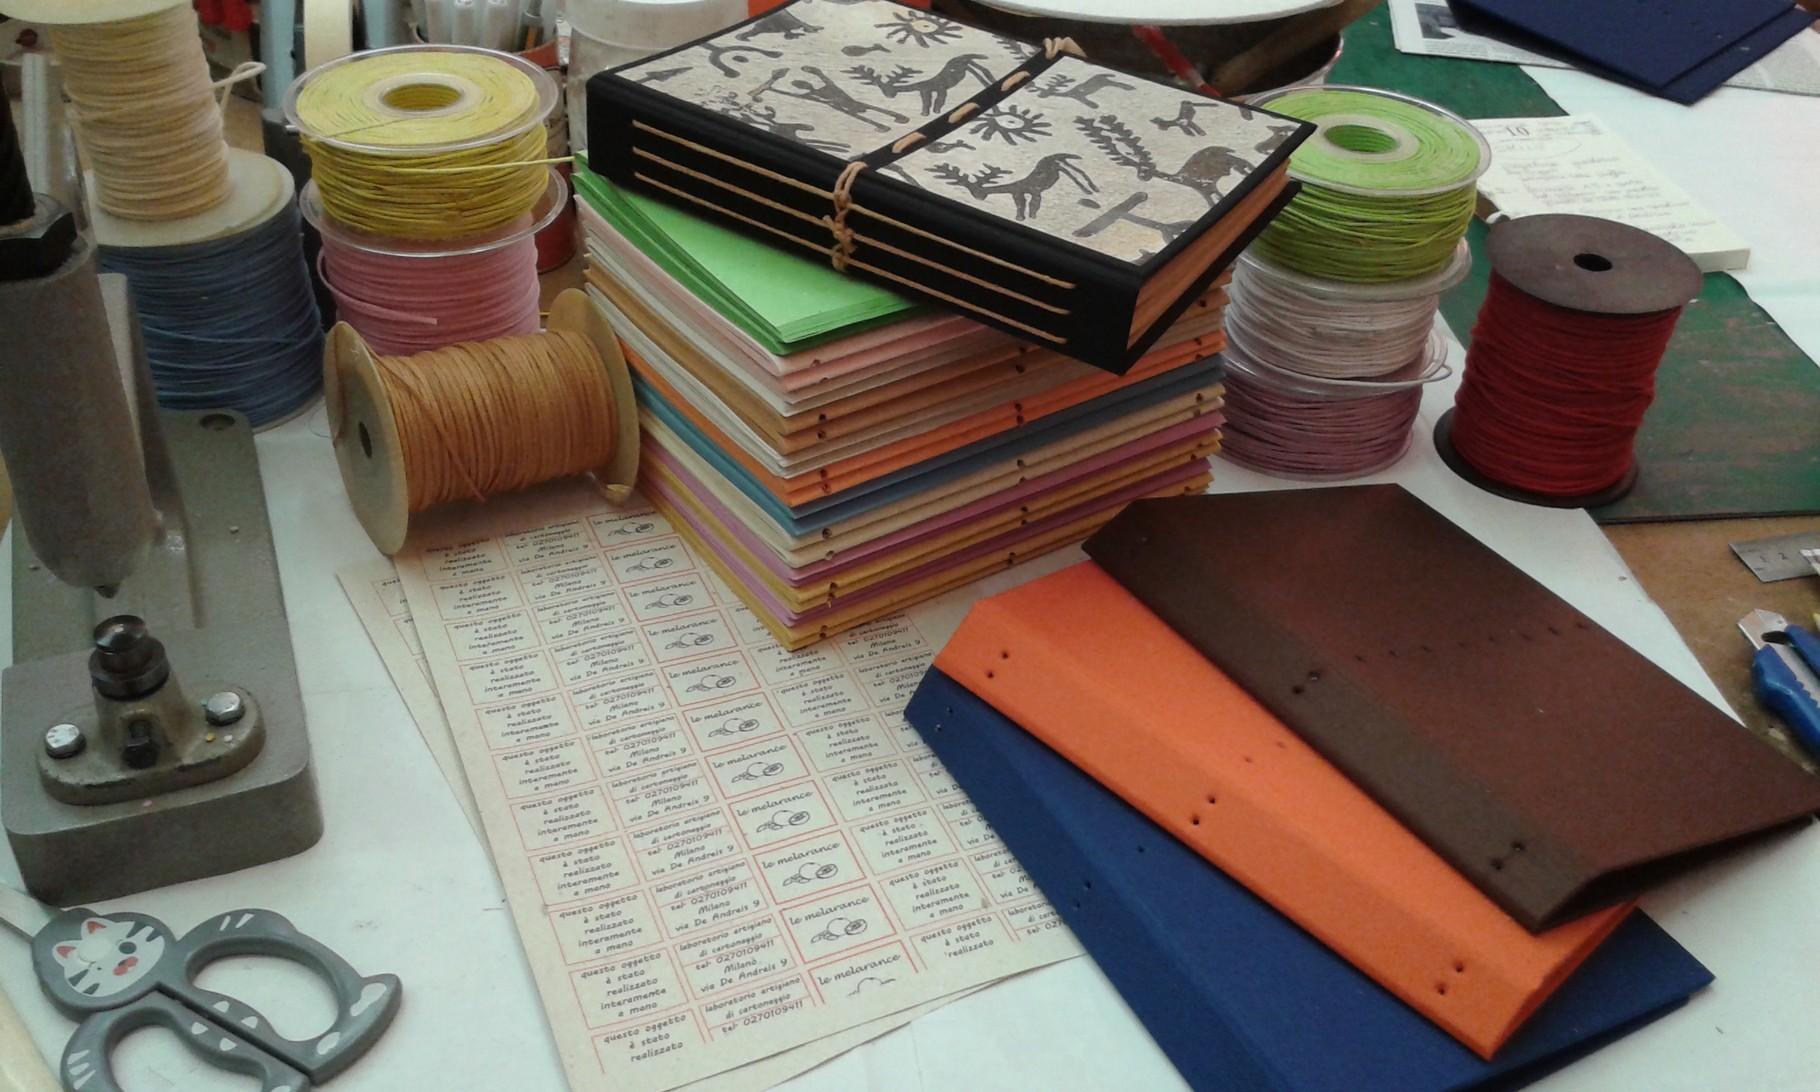 Lavorazioni di ogni genere di carta